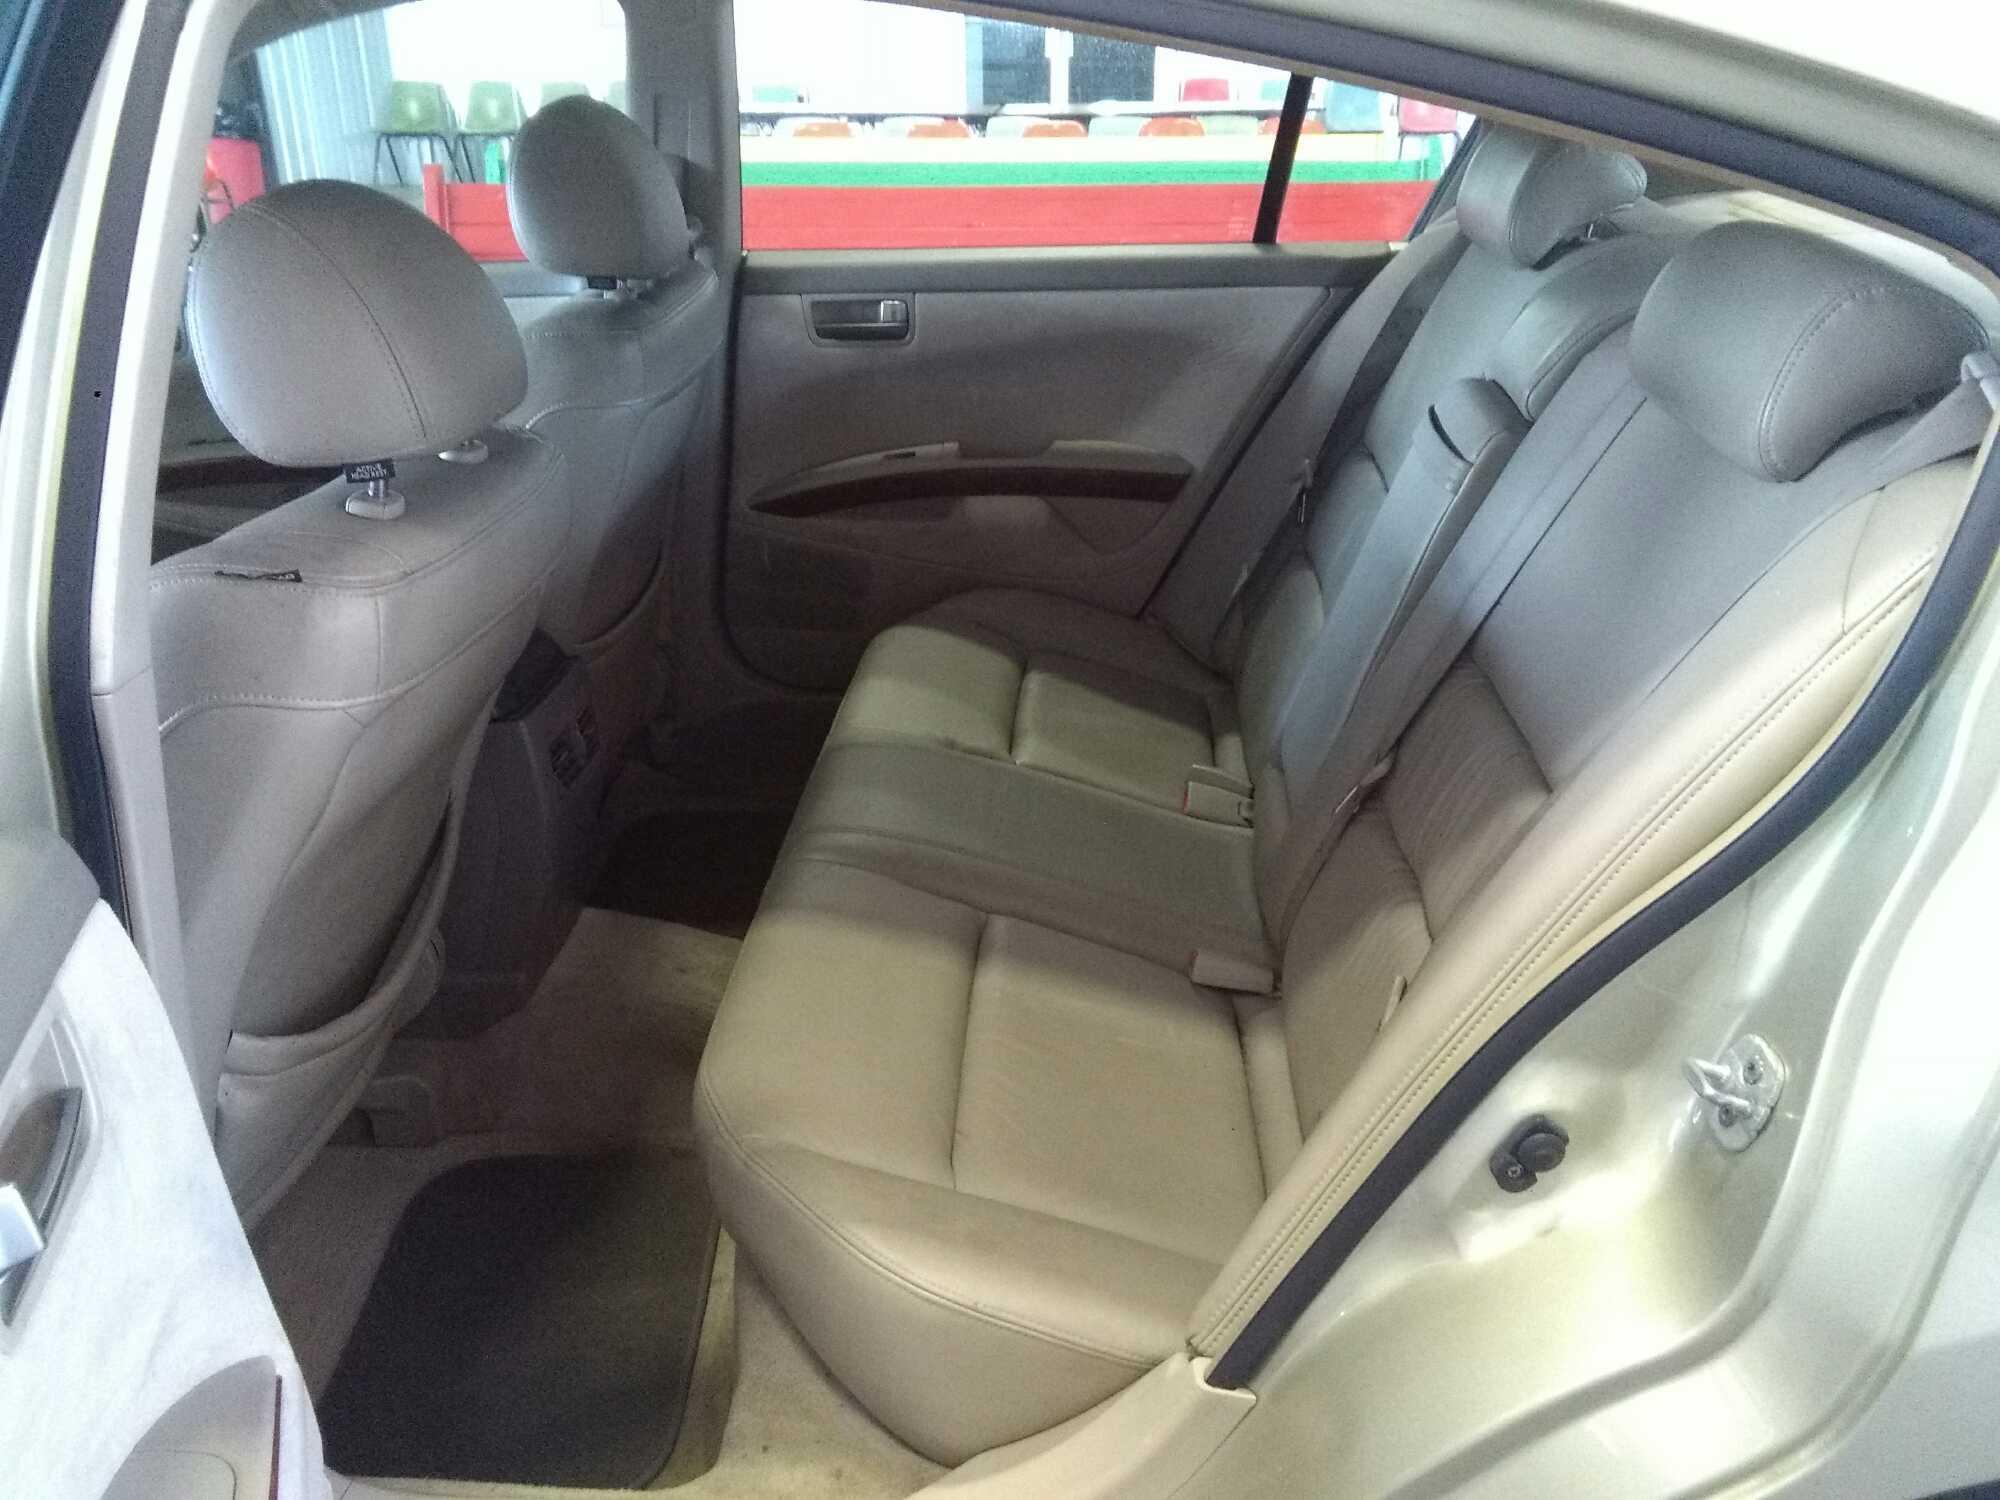 2004 Nissan Maxima Passenger Car, VIN # 1N4BA41E94C841168 | Mayco